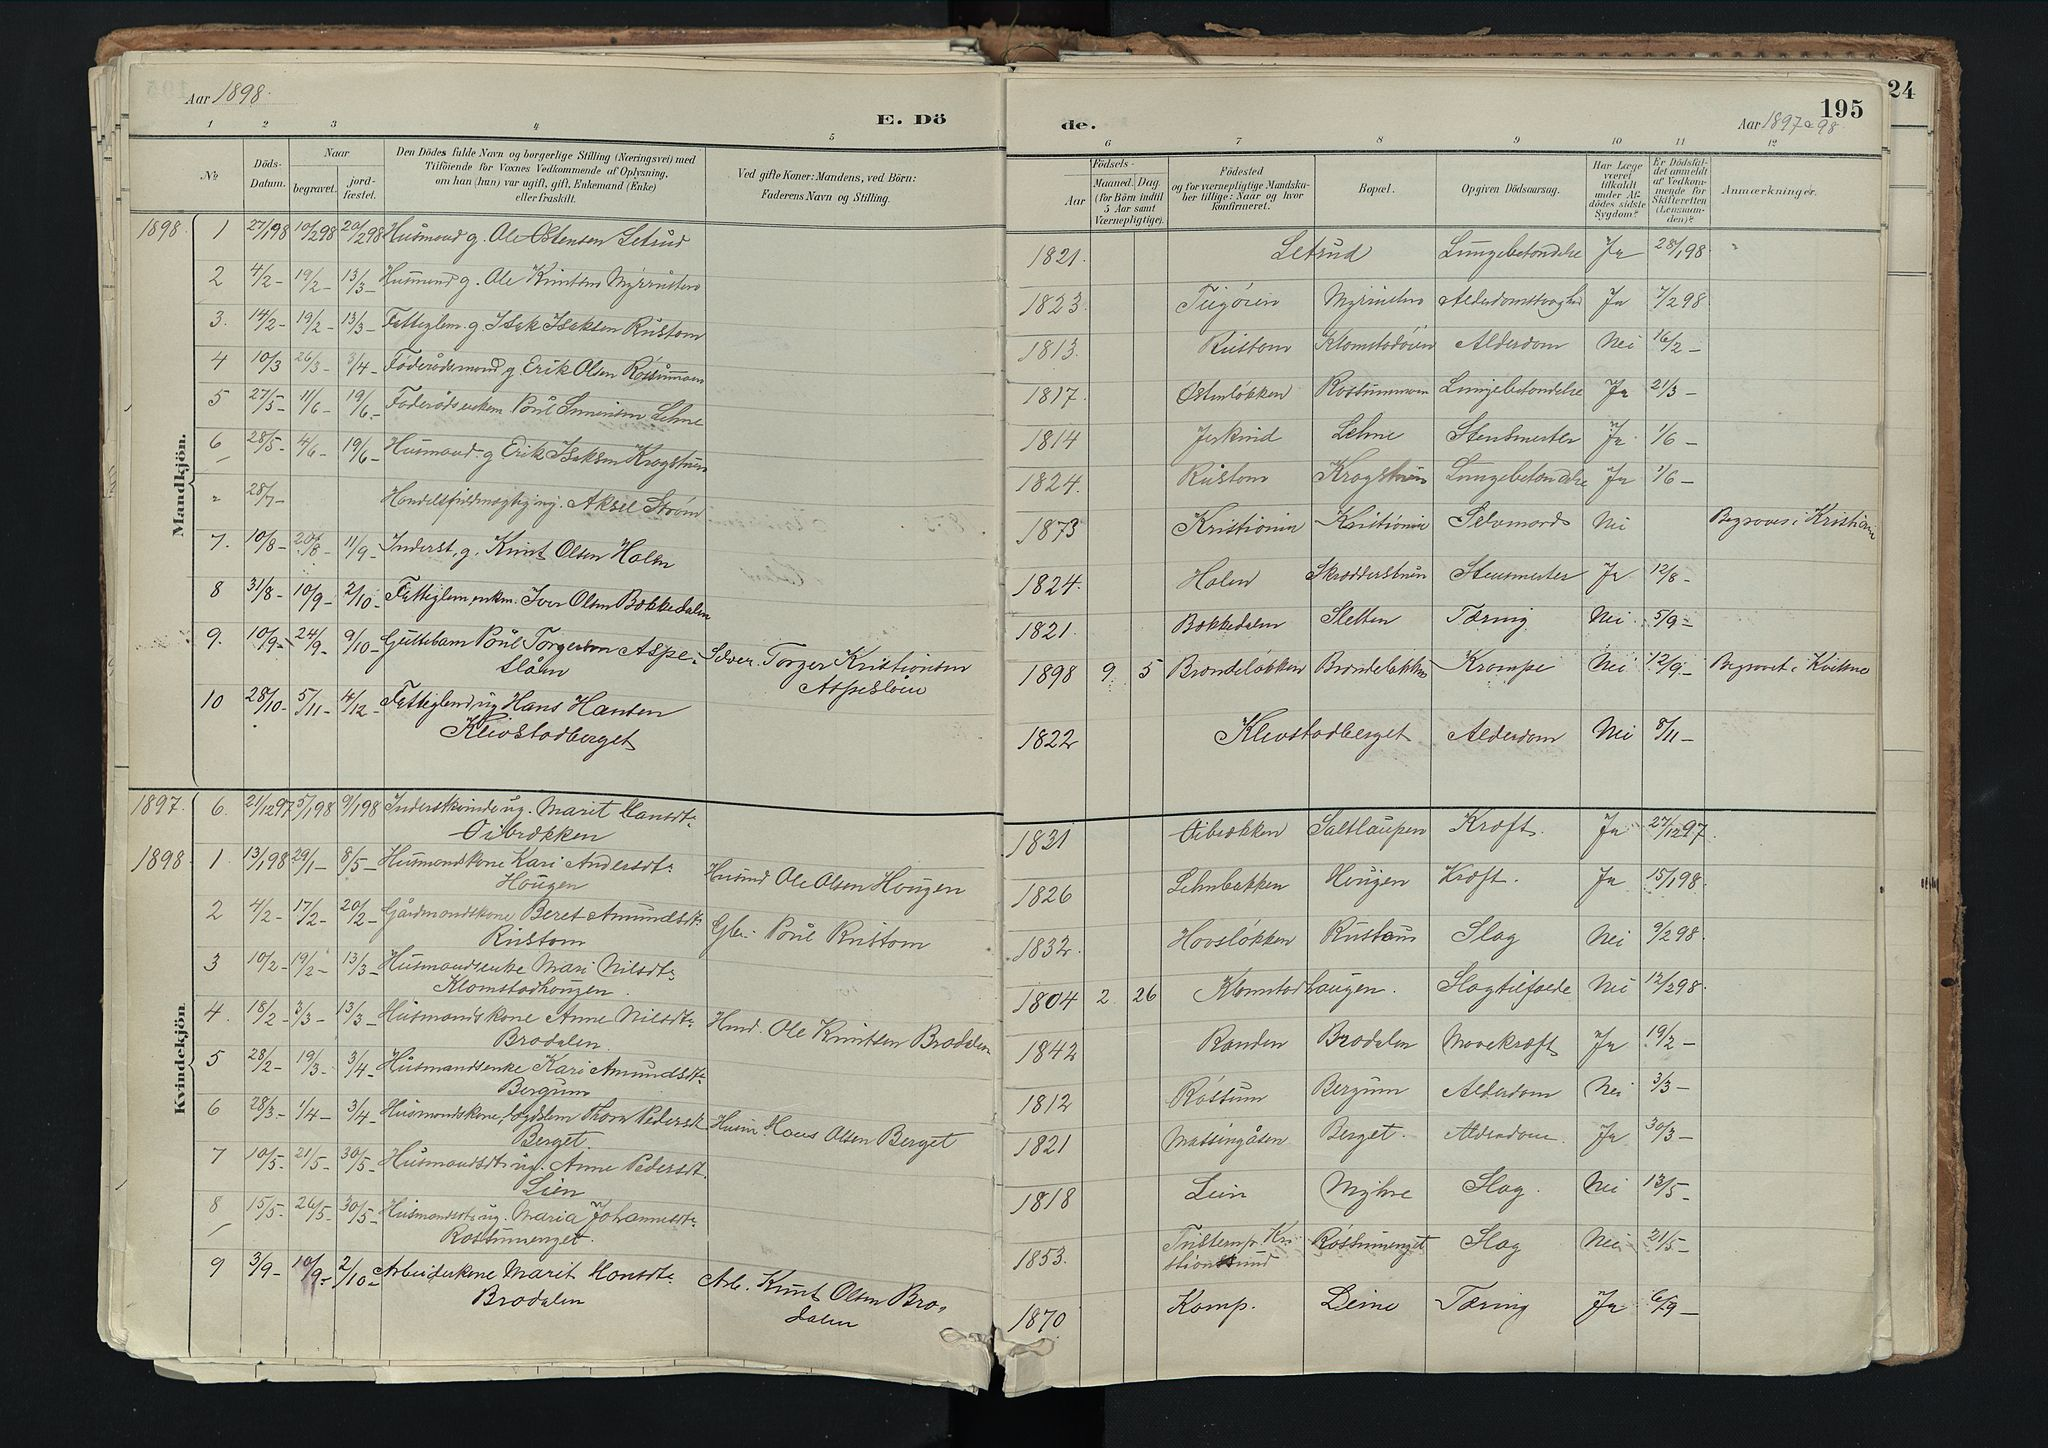 SAH, Nord-Fron prestekontor, Ministerialbok nr. 3, 1884-1914, s. 195